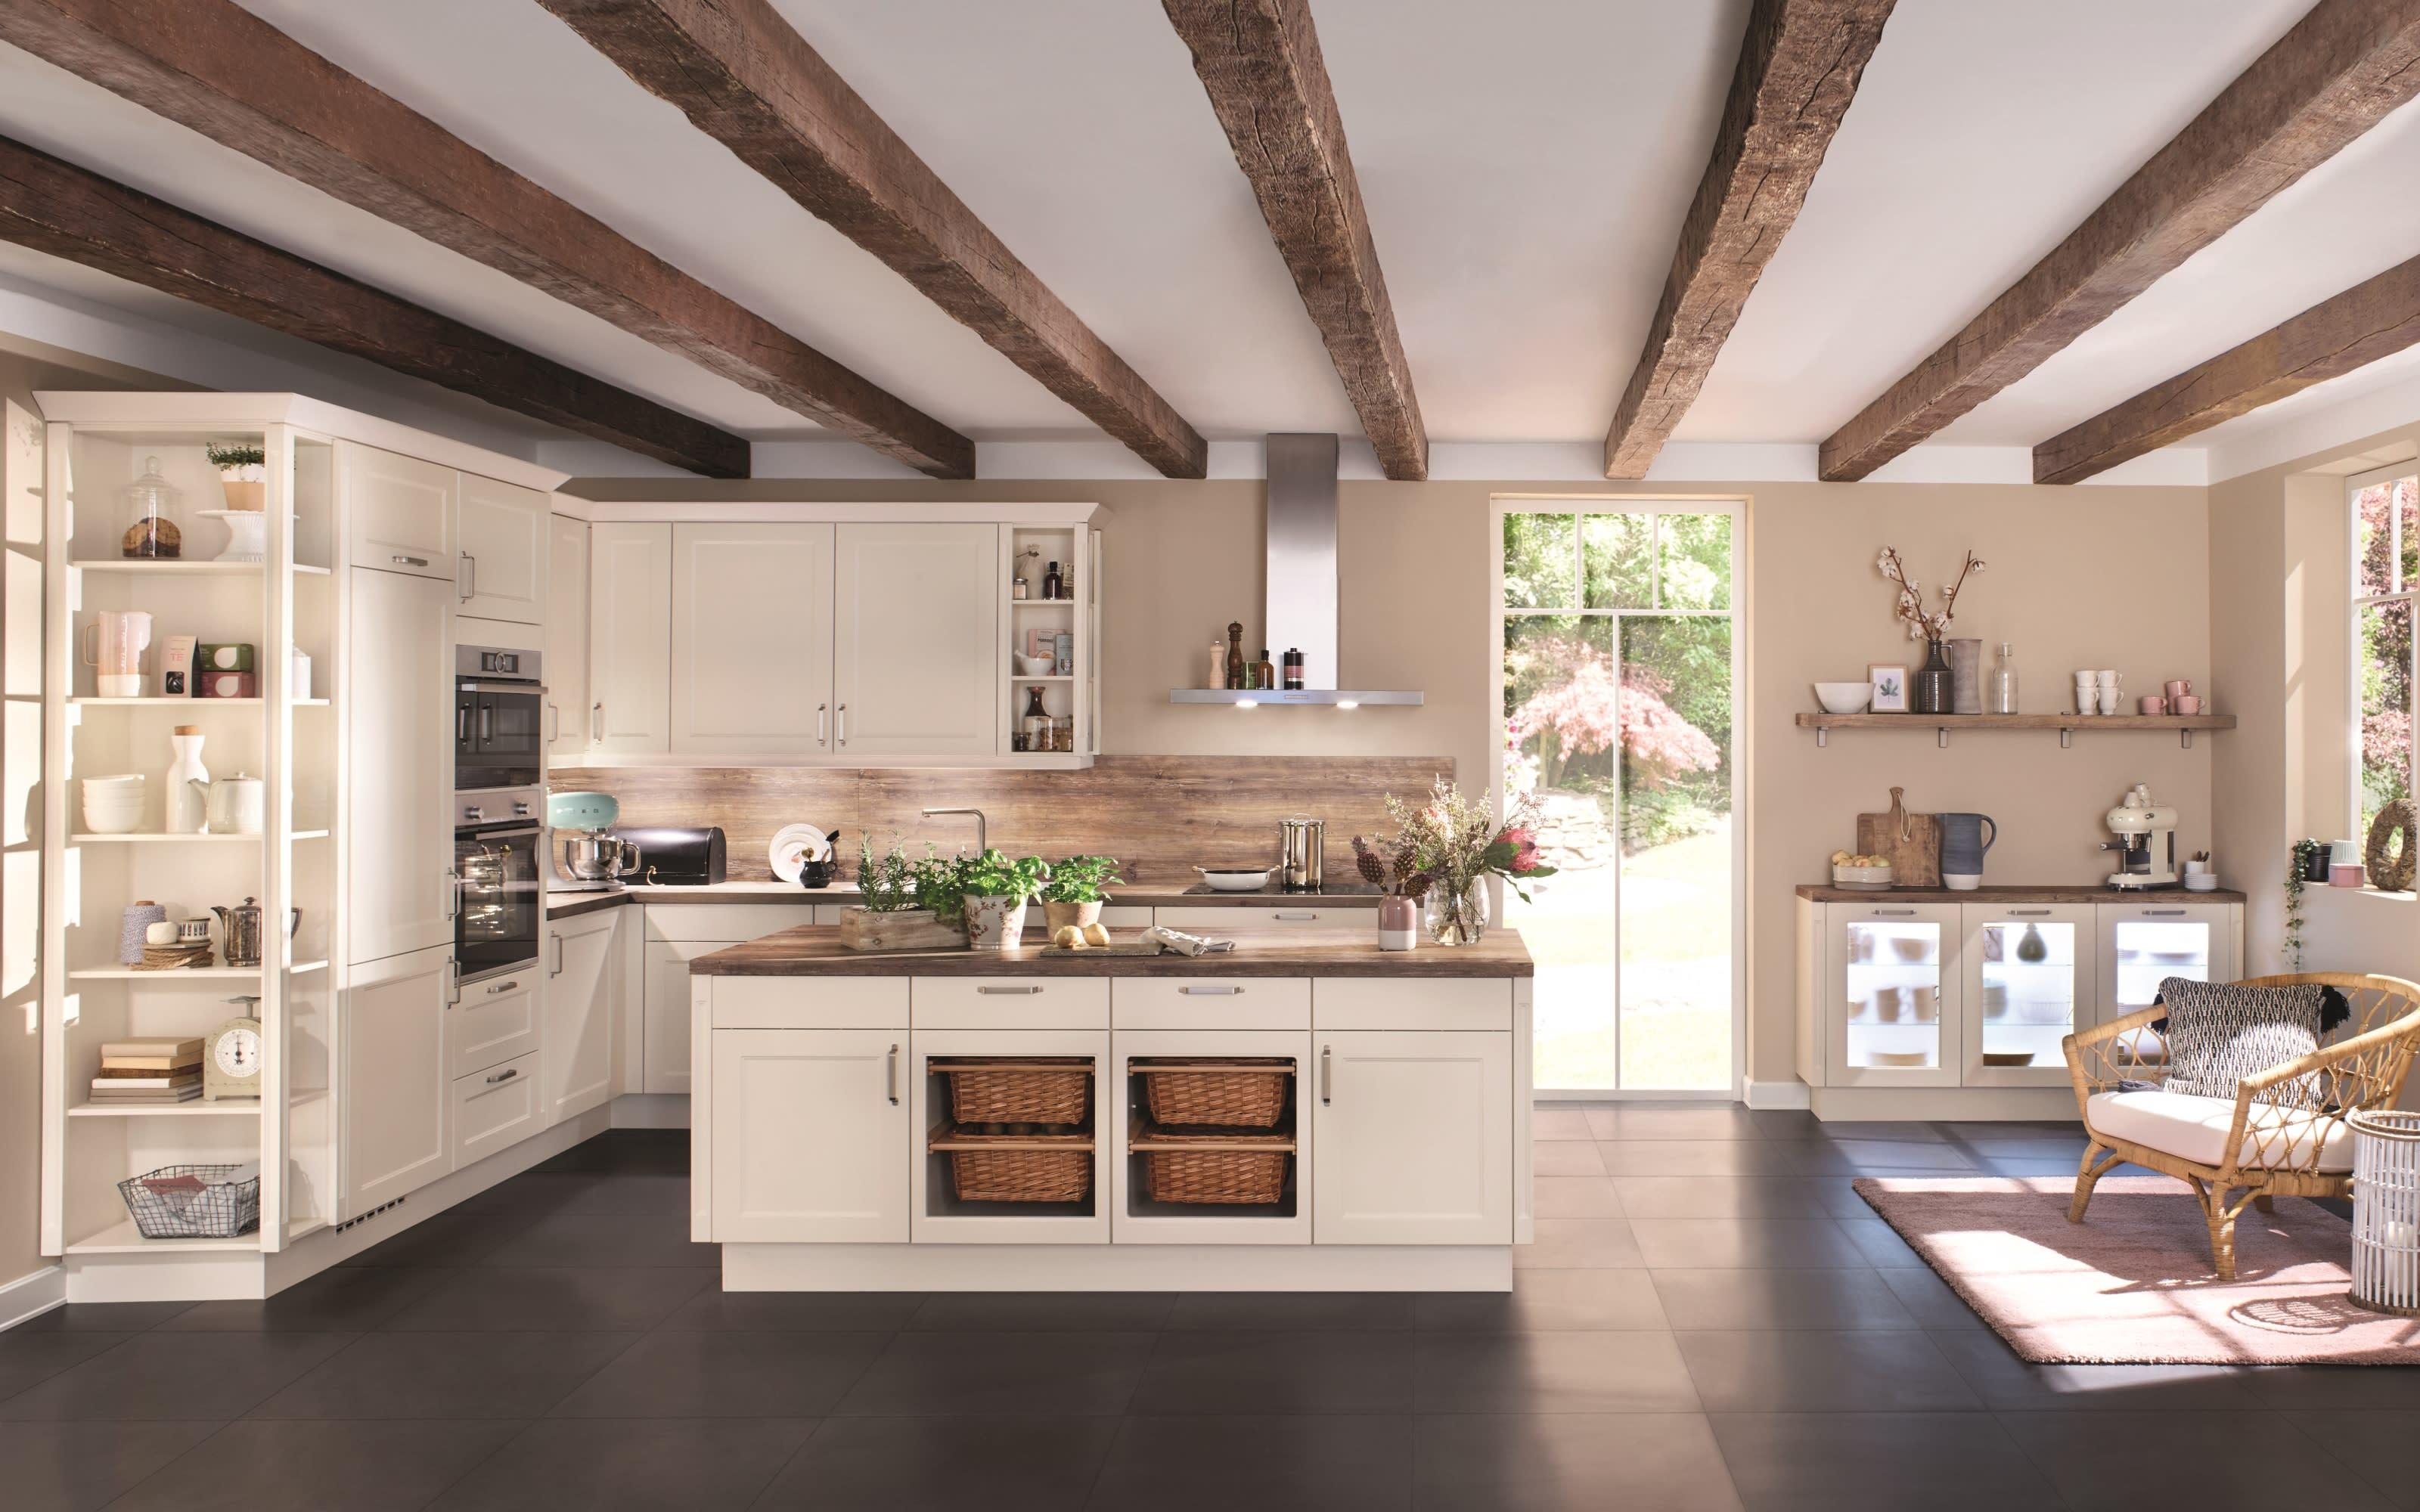 Einbauküche Chalet, magnolia matt, inklusive Siemens Elektrogeräte